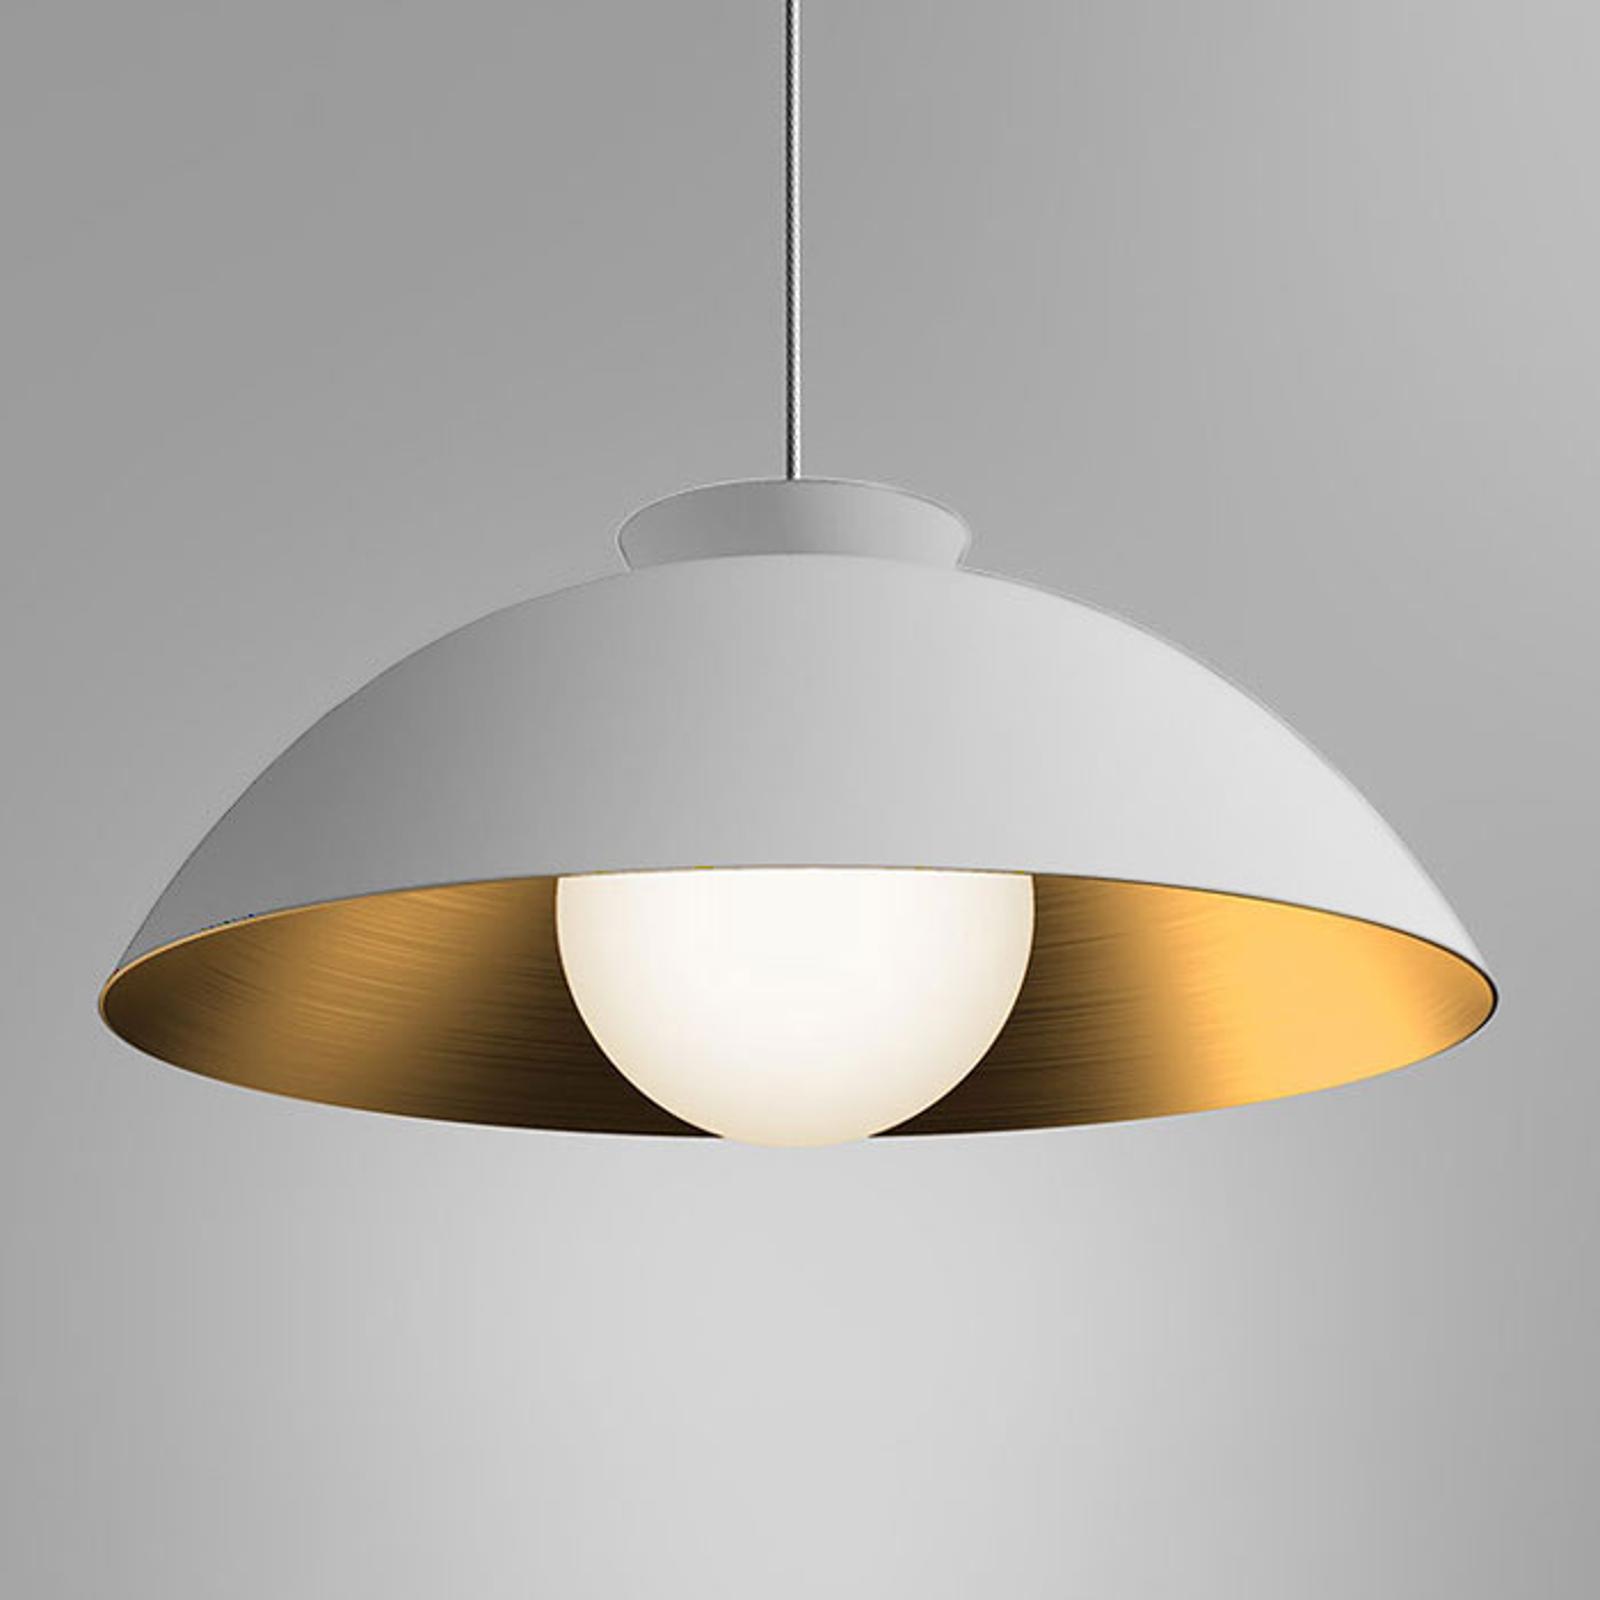 Innermost Chelsea hængelampe, Ø 56 cm, hvid